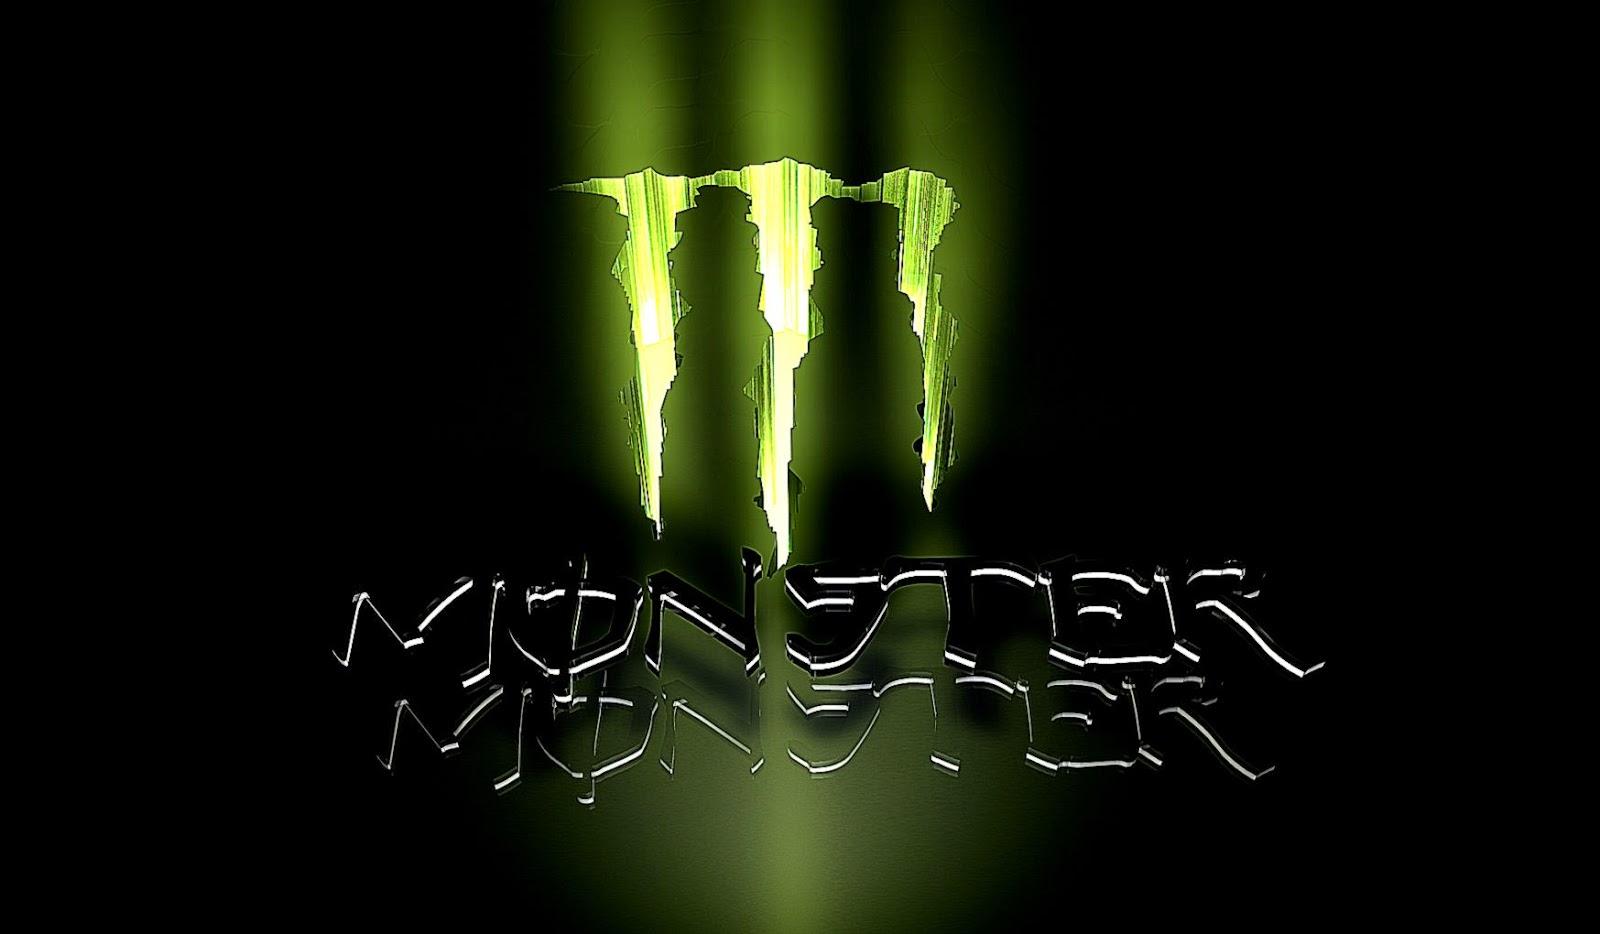 3d monster hd wallpaper photo wallpapers - Monster energy wallpaper download ...